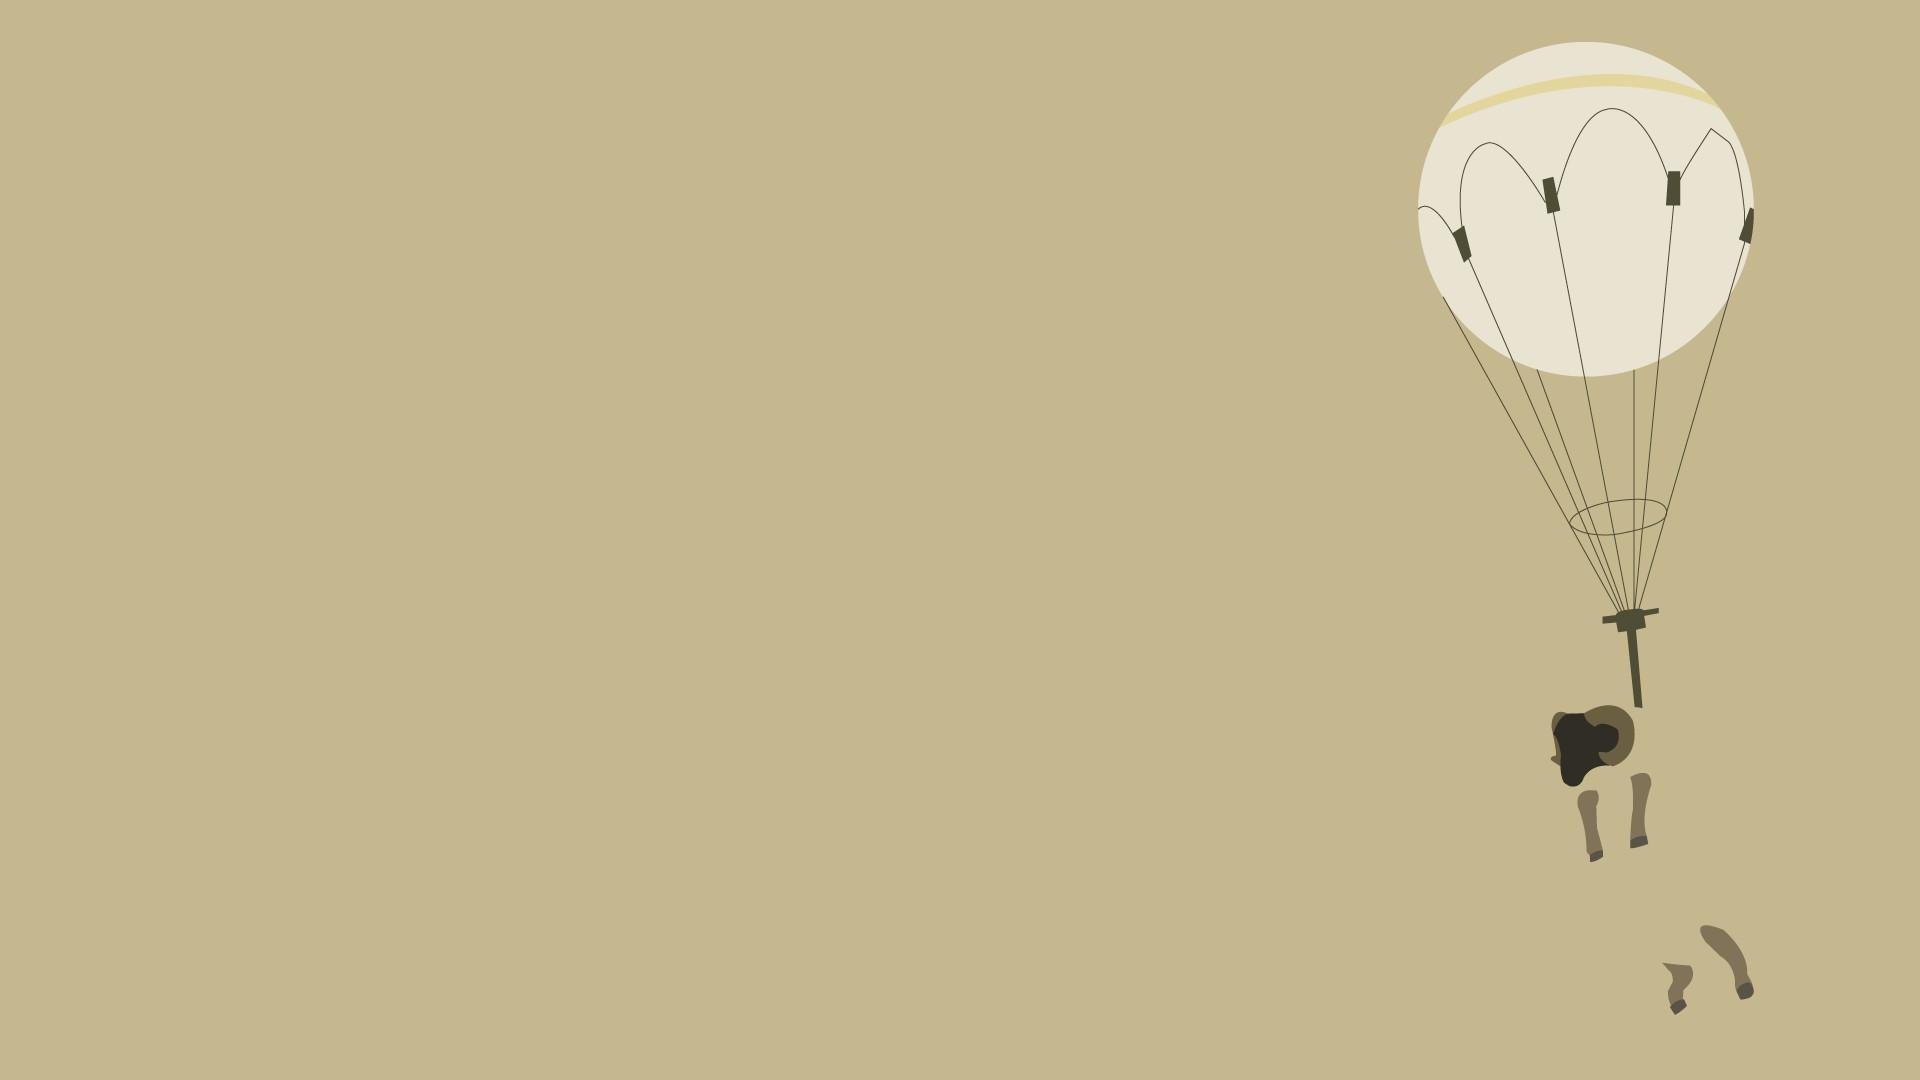 I like to make minimalist wallpapers. Hope you enjoy my latest one!